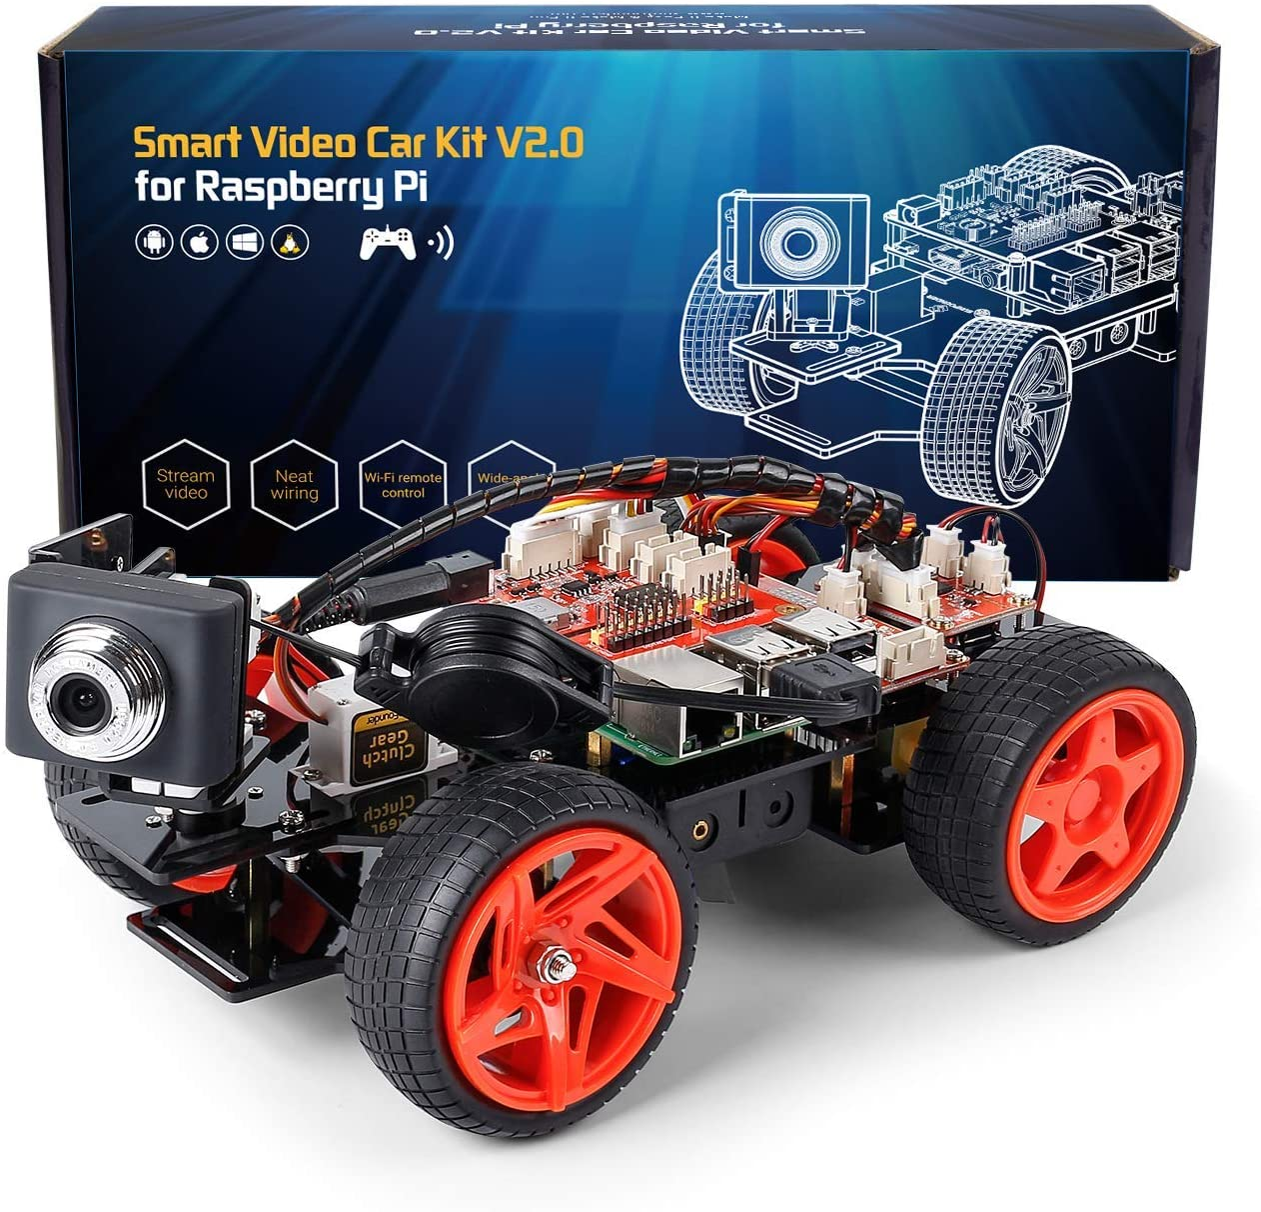 SunFounder Smart Video Car Kit V2.0 Raspberry Pi 4 Model B 3B+ 3B 2B Graphical Visual Programming Language,Video Transmission,Remote Control by UI on Windows Mac Web Browser with Detail Manual